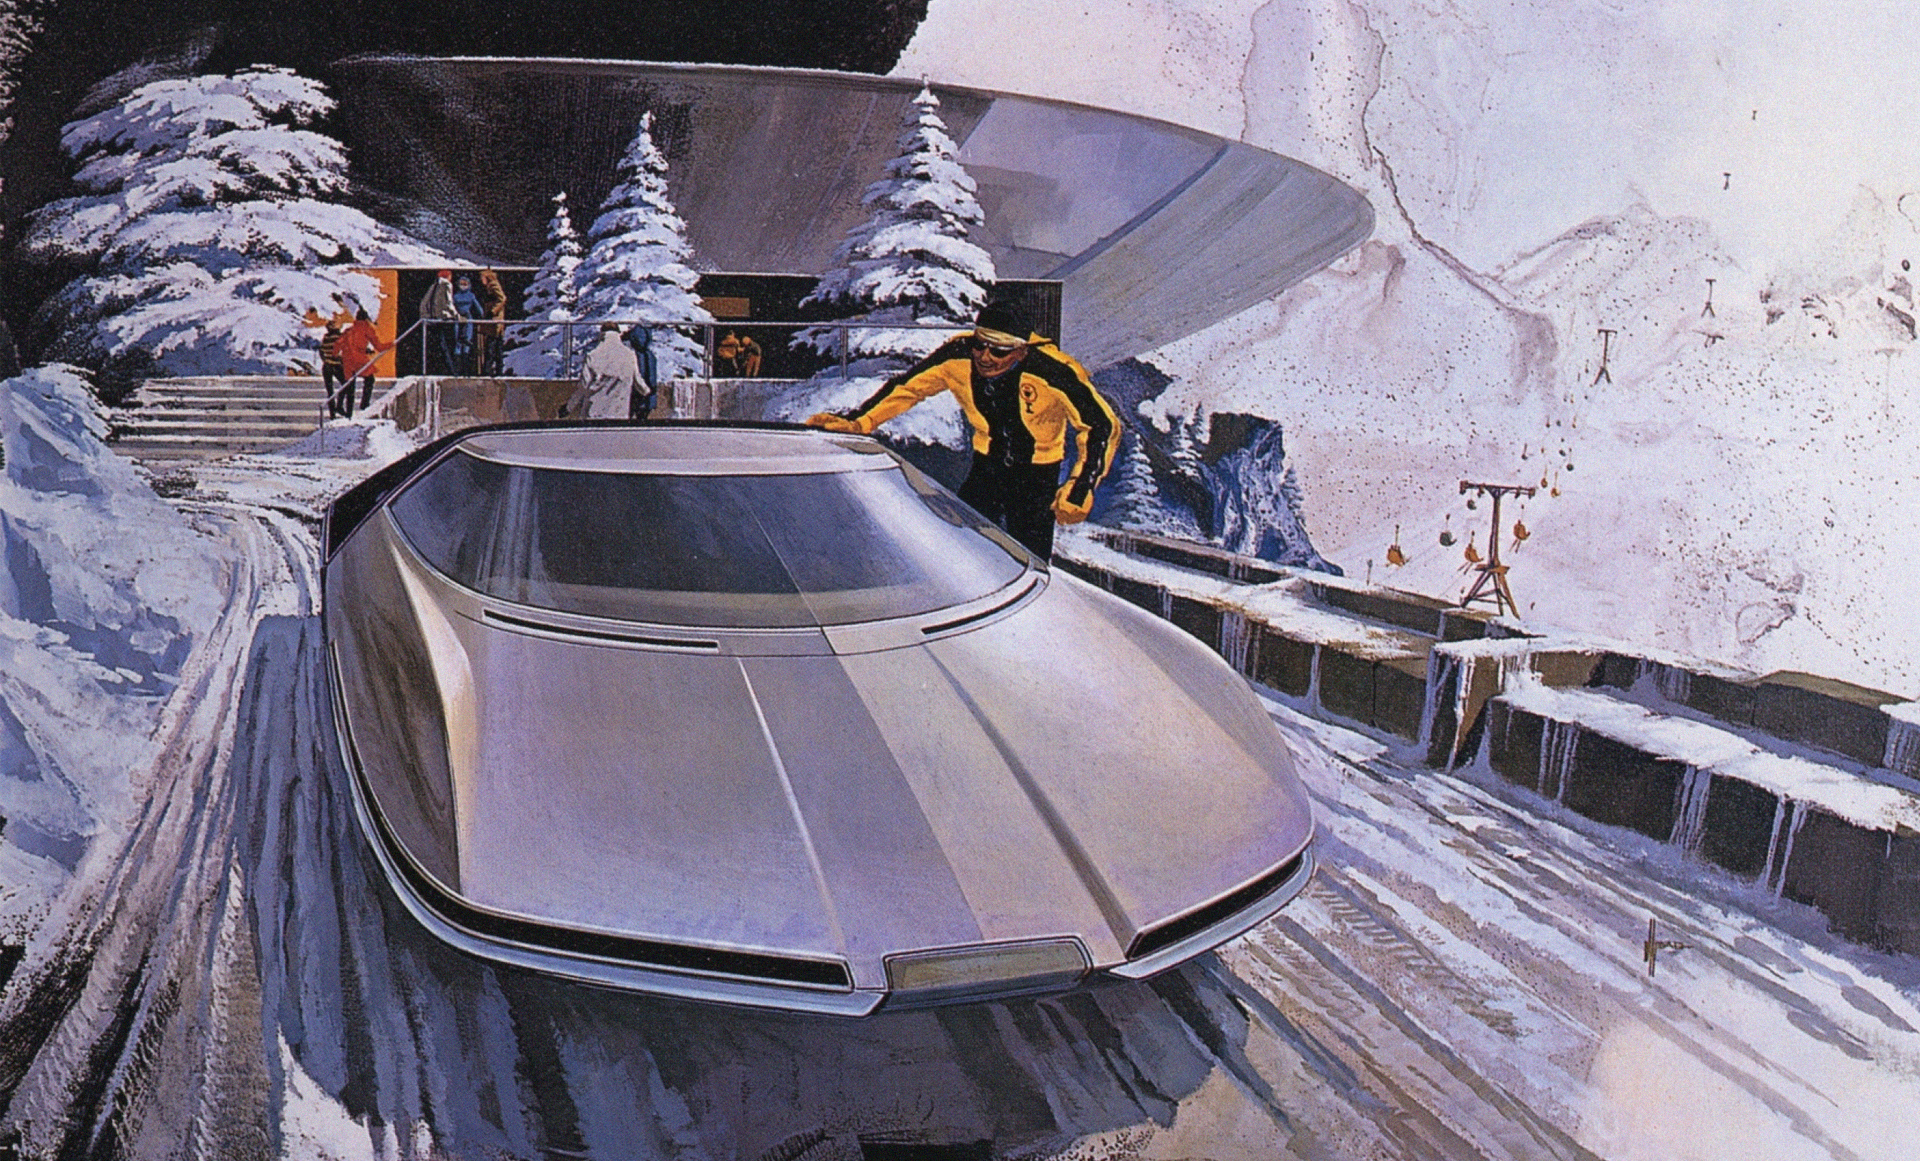 Кино, автопилот и батарейки: какими будут автомобили через 10-20 лет?. Фото 16